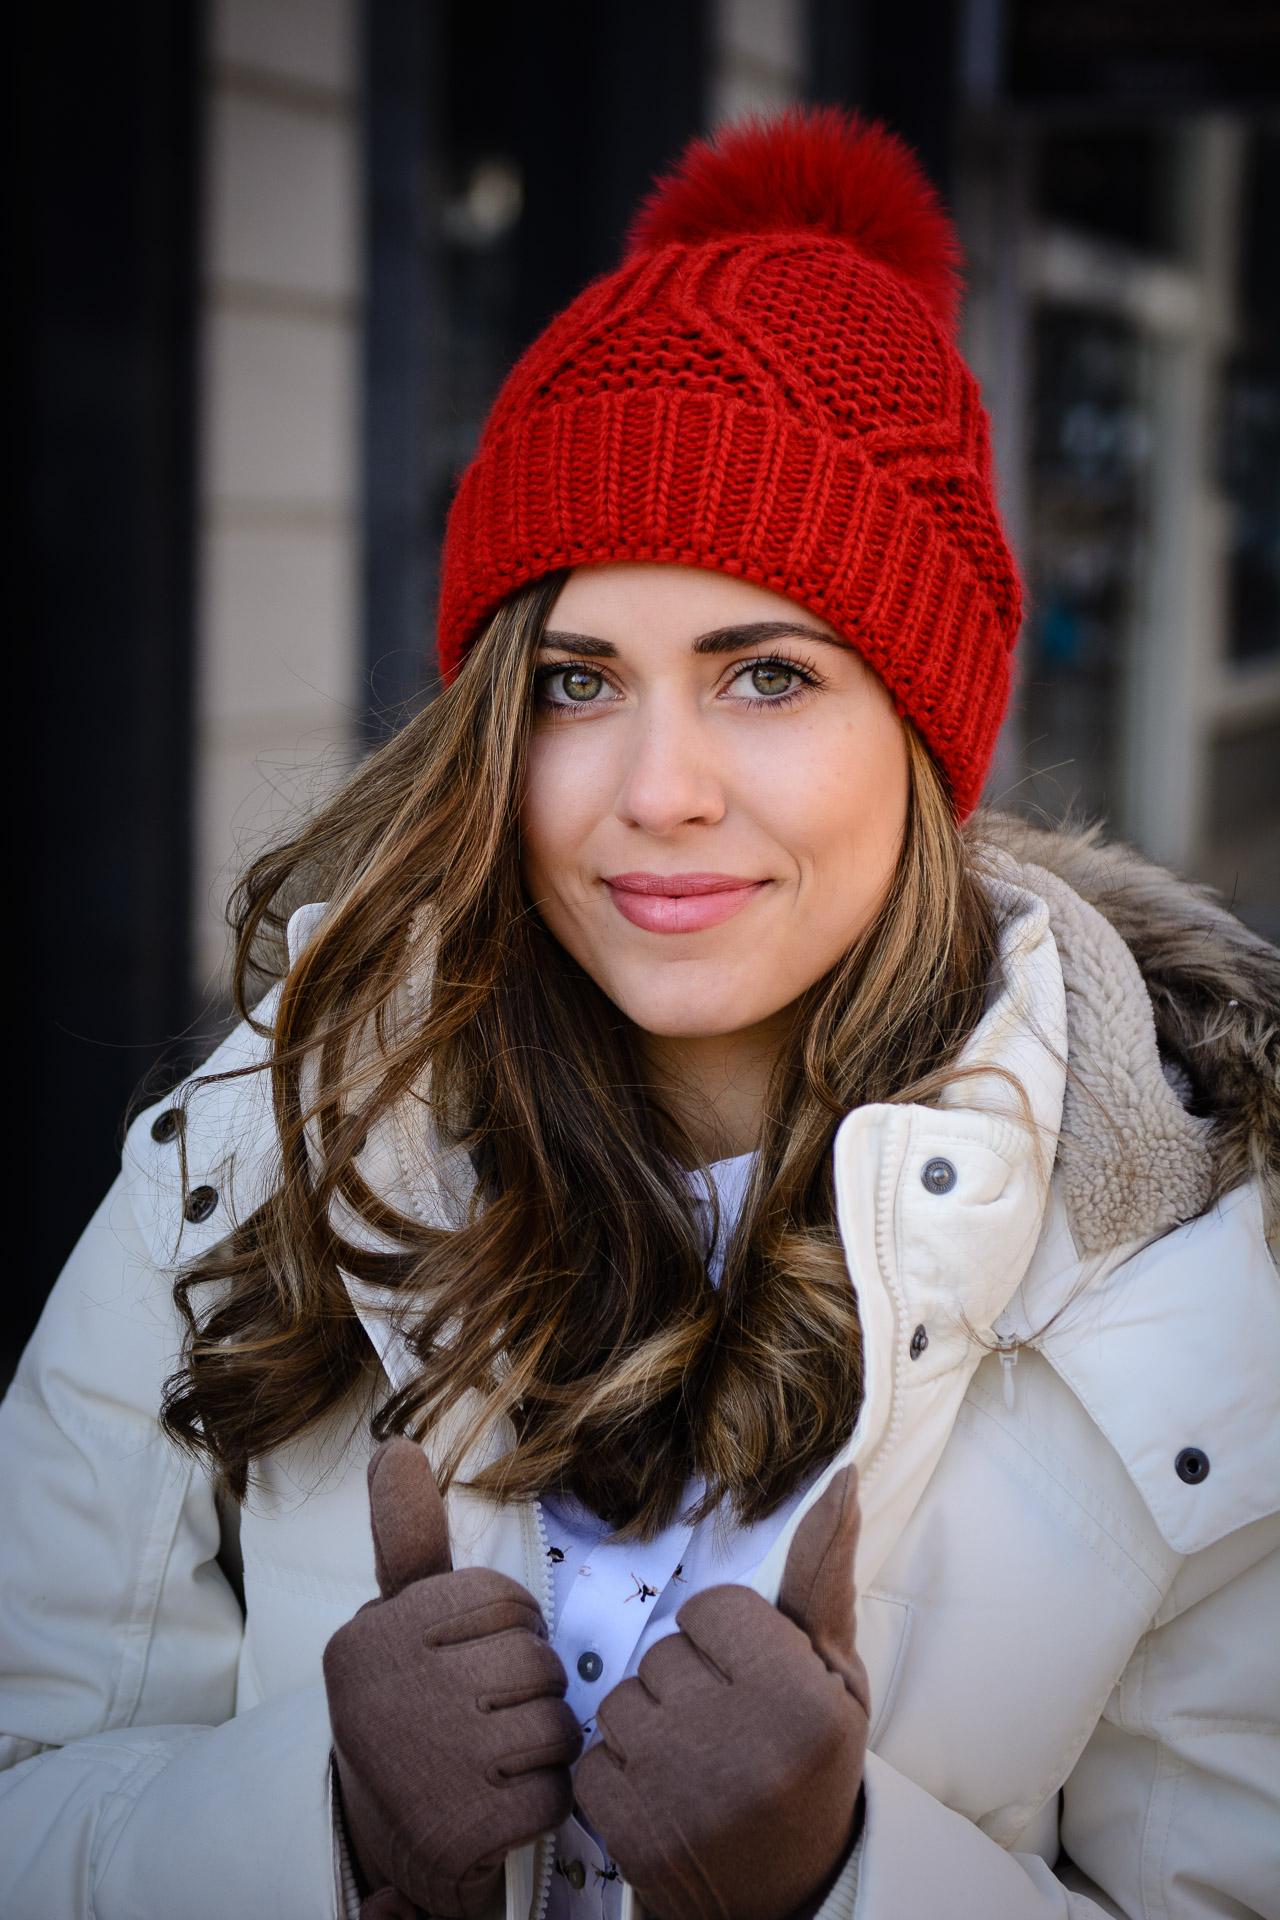 Top bulgarian blogger Denina